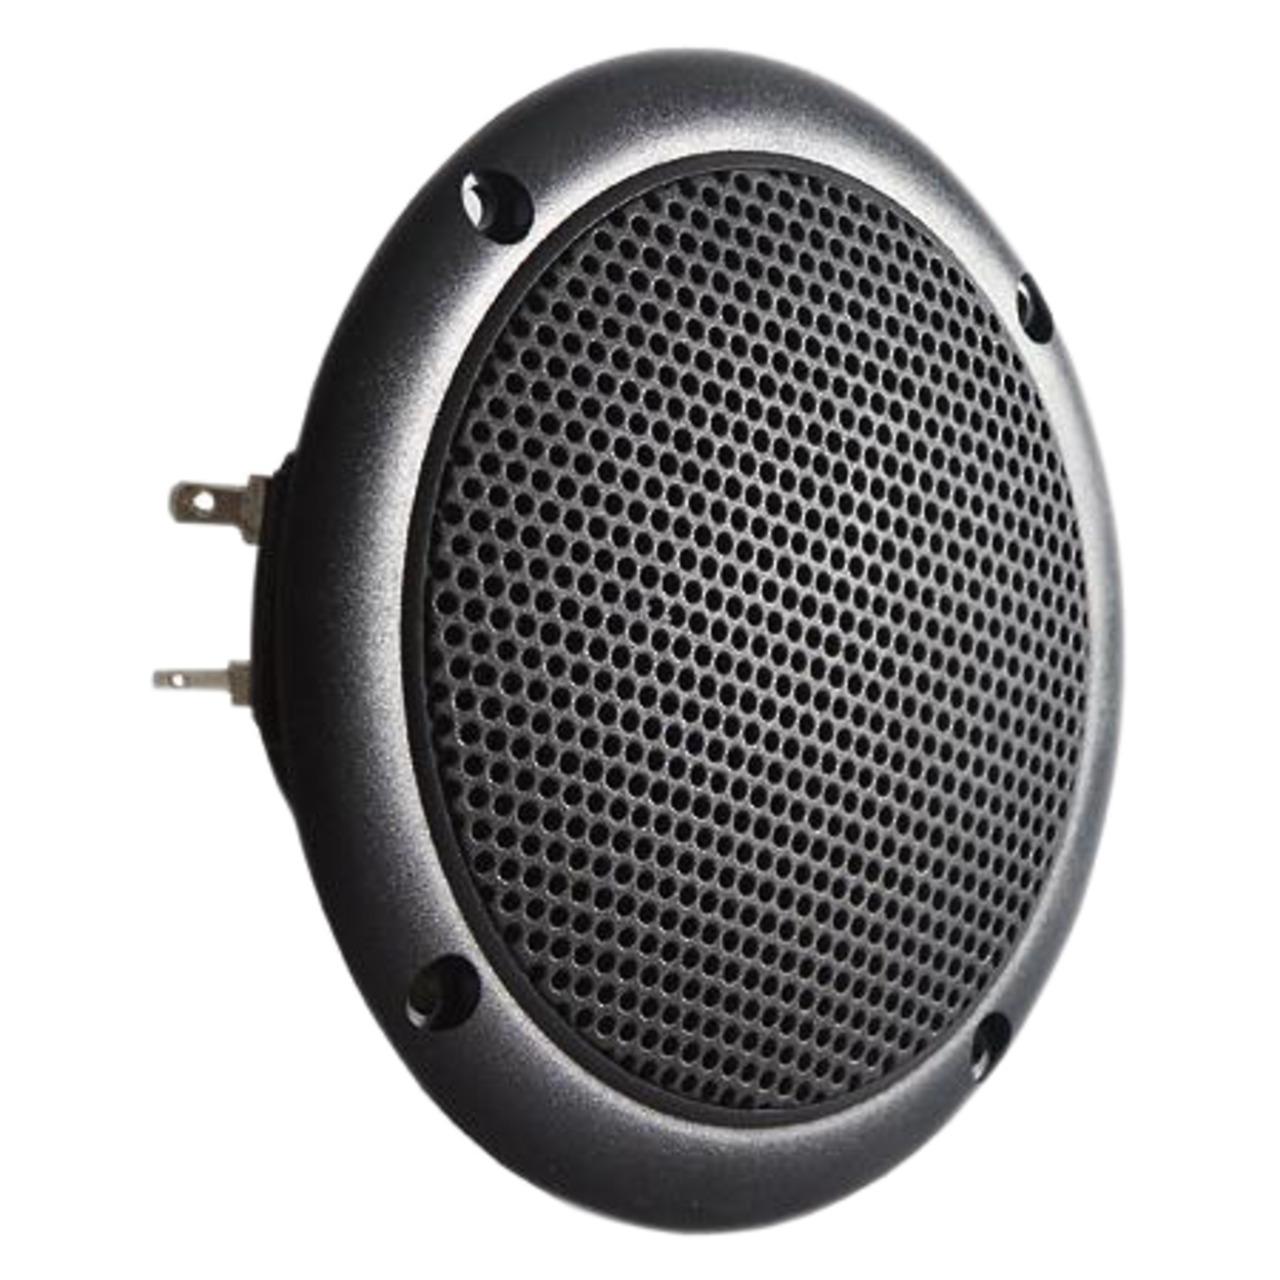 VISATON wasserfester Breitbandlautsprecher 10cm- FR 10 WP- schwarz - 4 Ohm